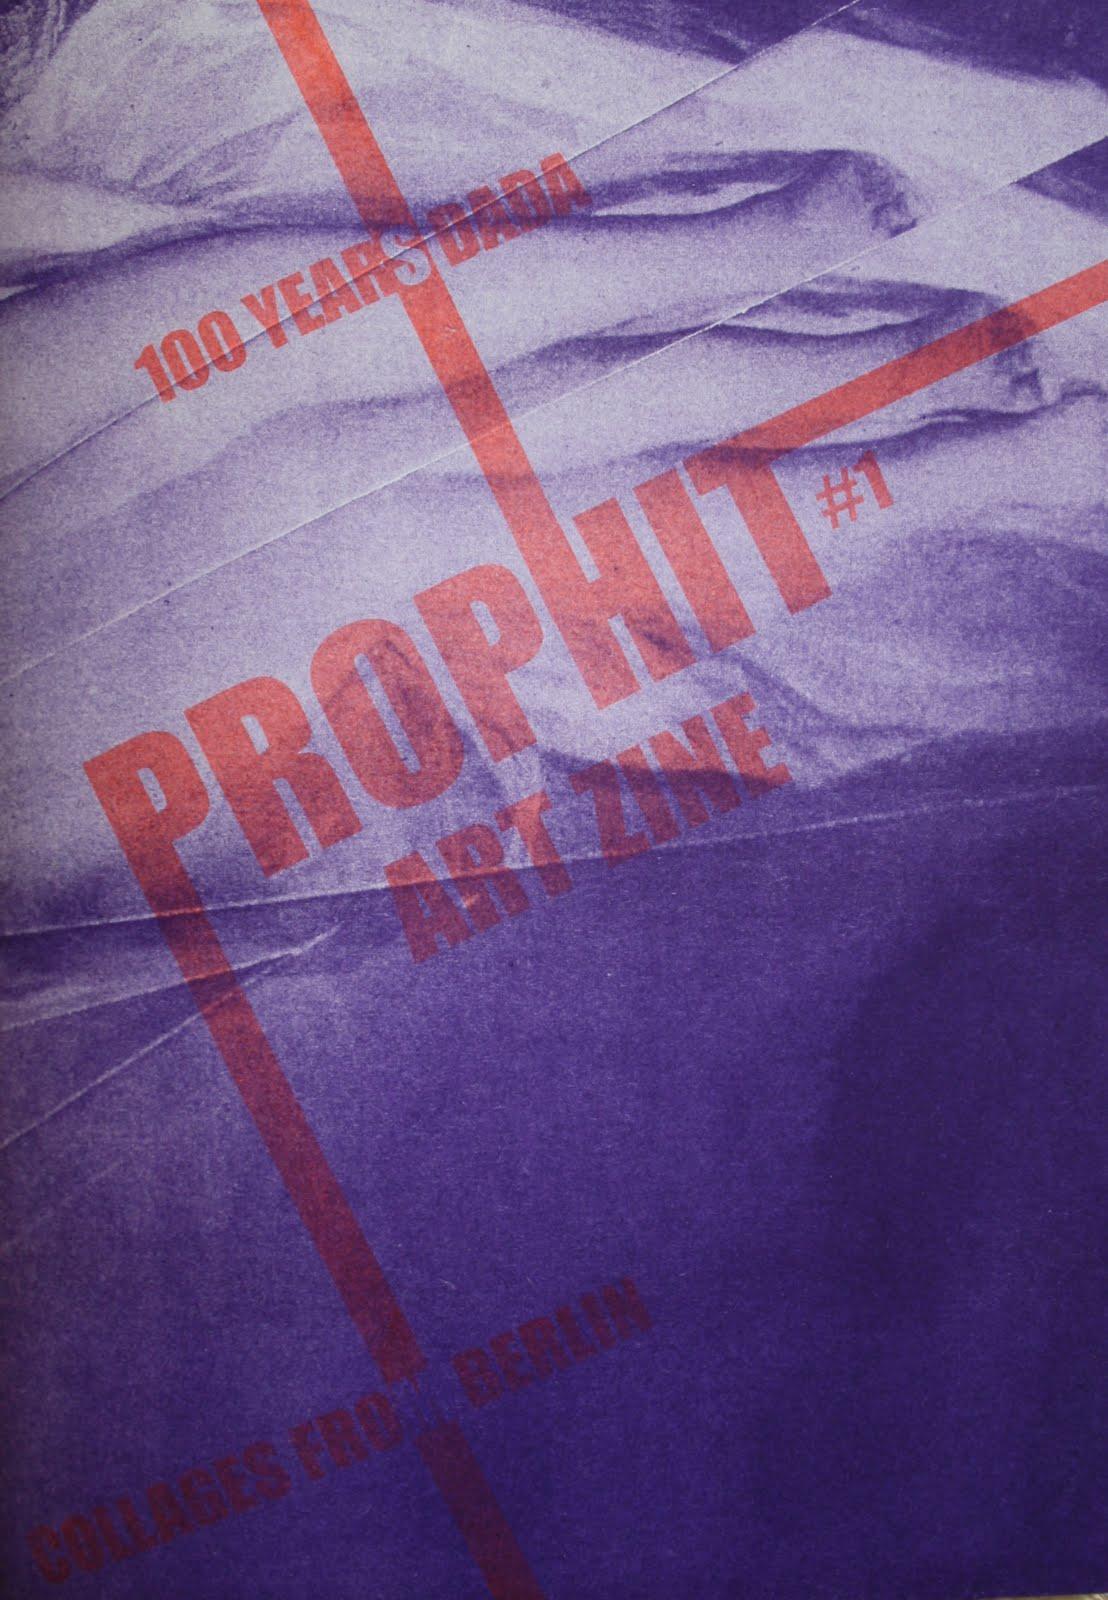 Prophit #1